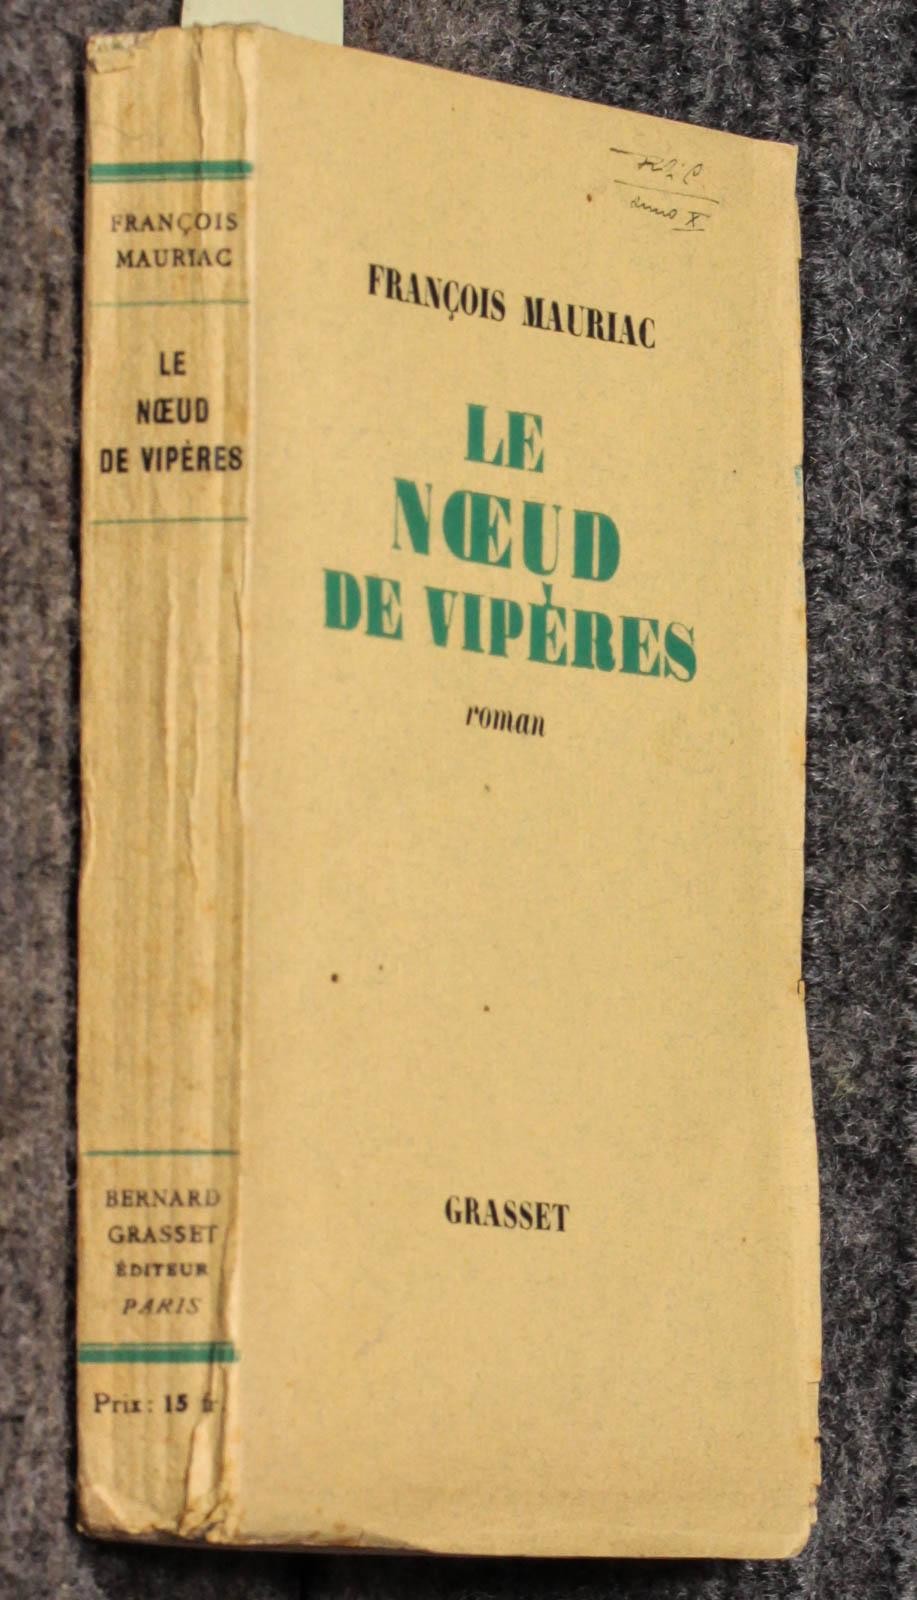 Le Noeud De Viperes [limited Edition] Francois Mauriac